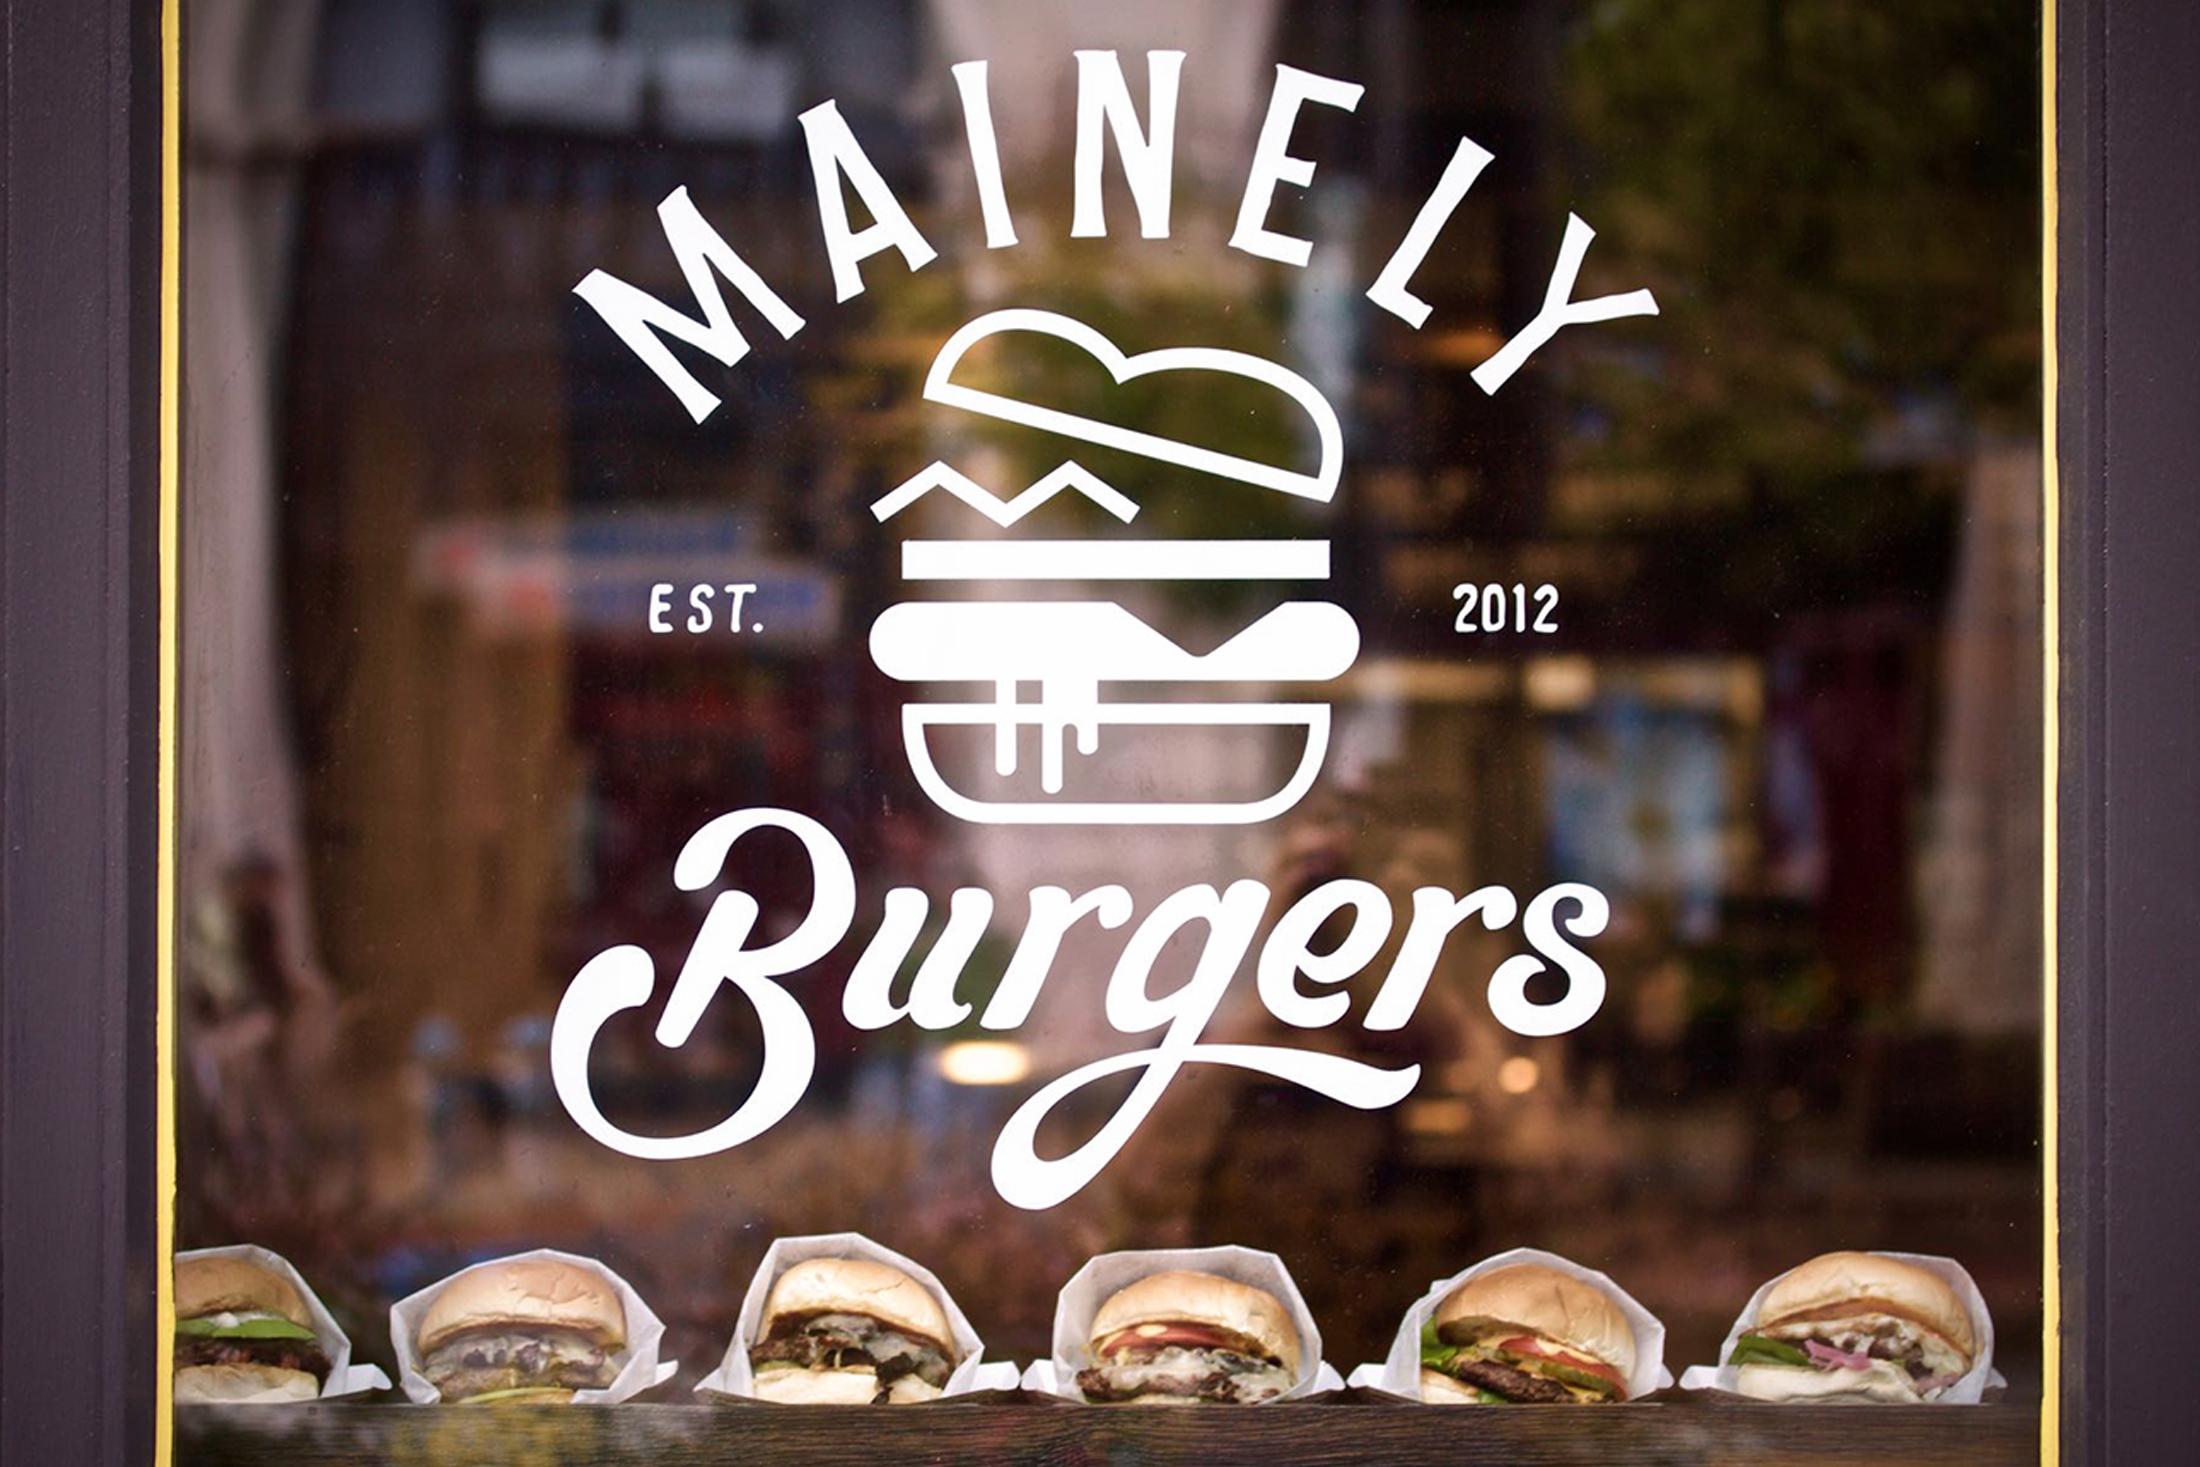 Mainely-Burgers-burger-window.jpg